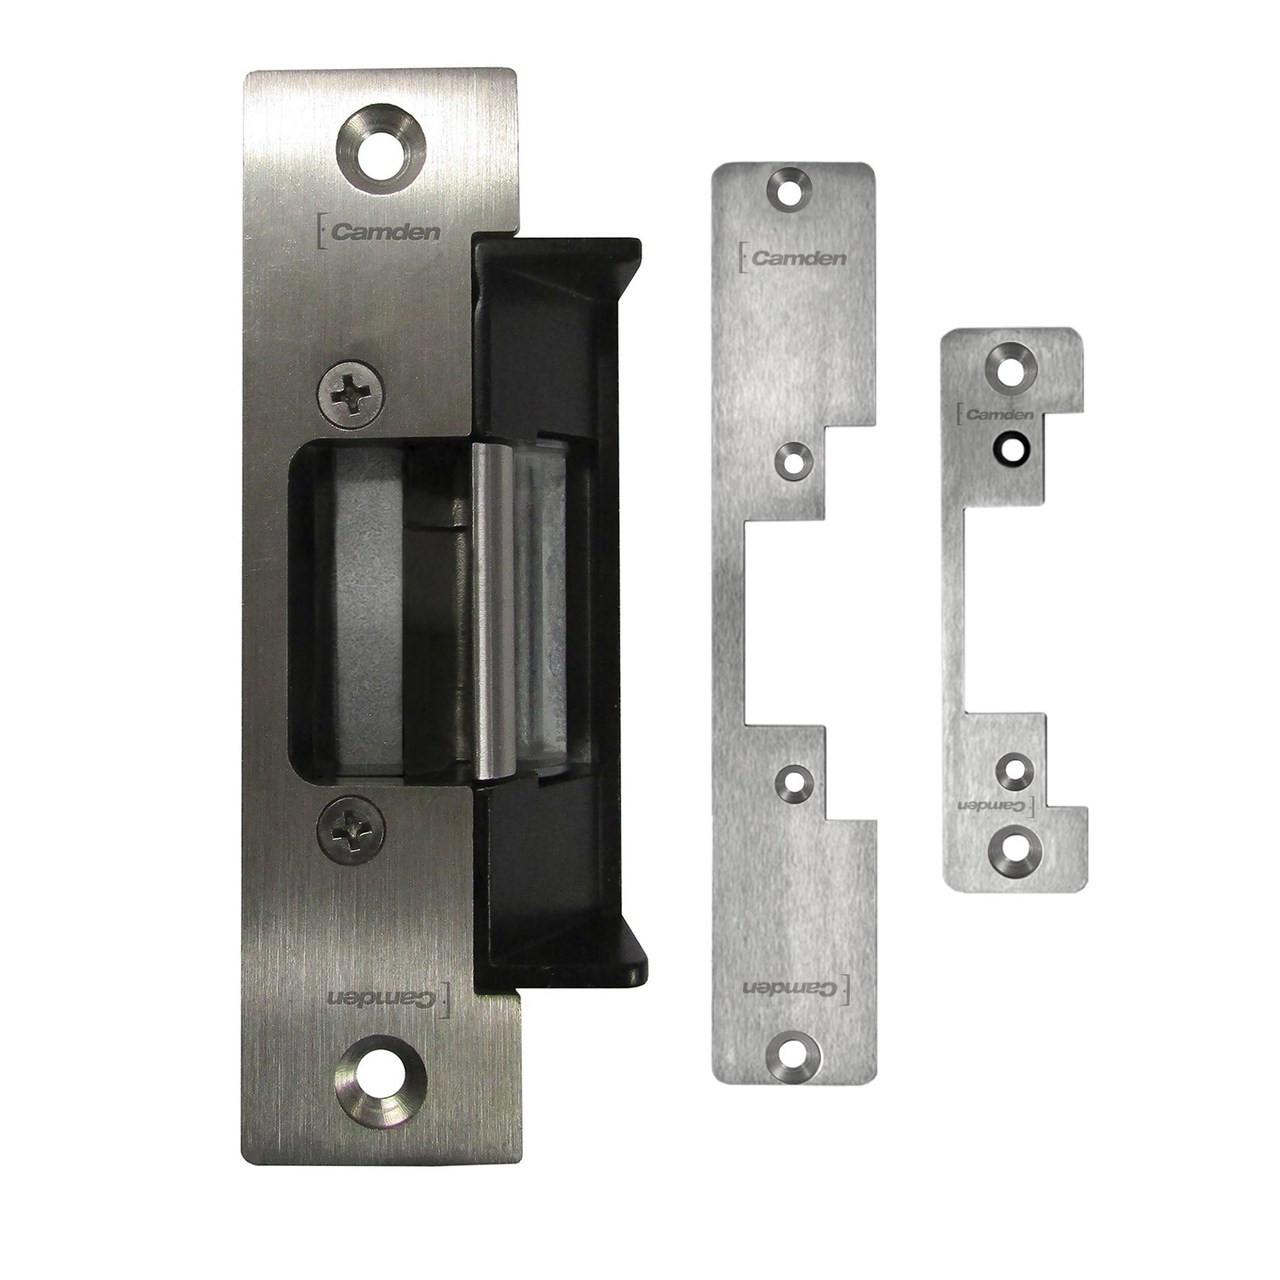 cx ed2079 universal electric door strike 12 24v ac dc fail safe